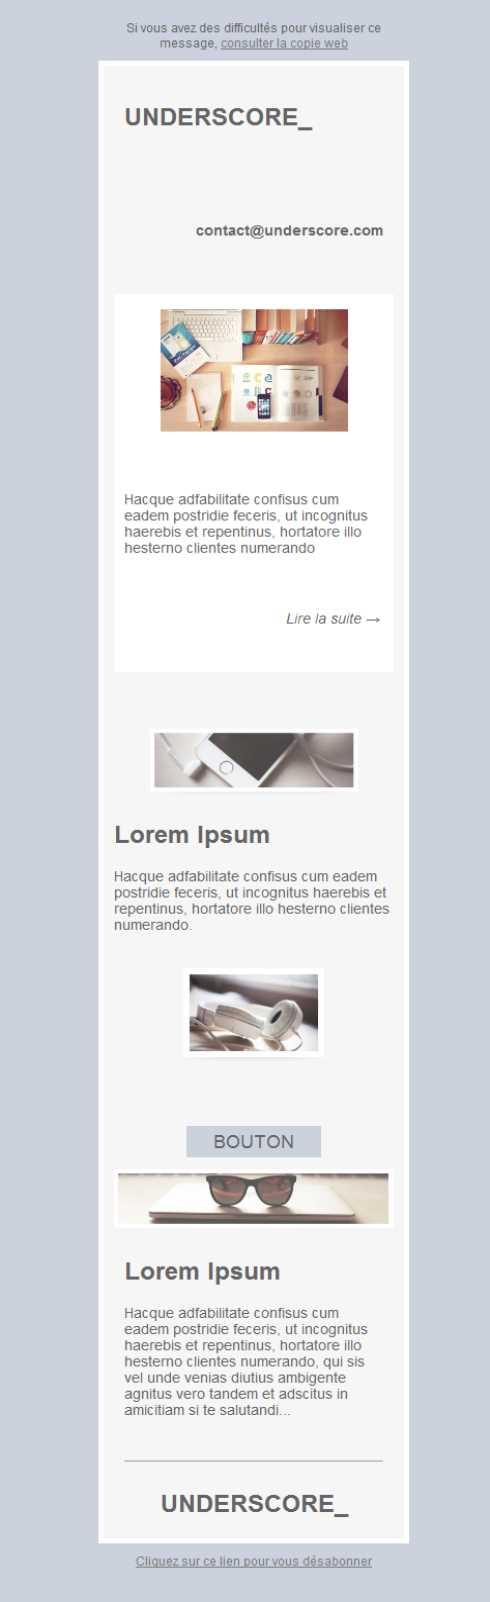 Free email templates - Download design Underscore - underscore template